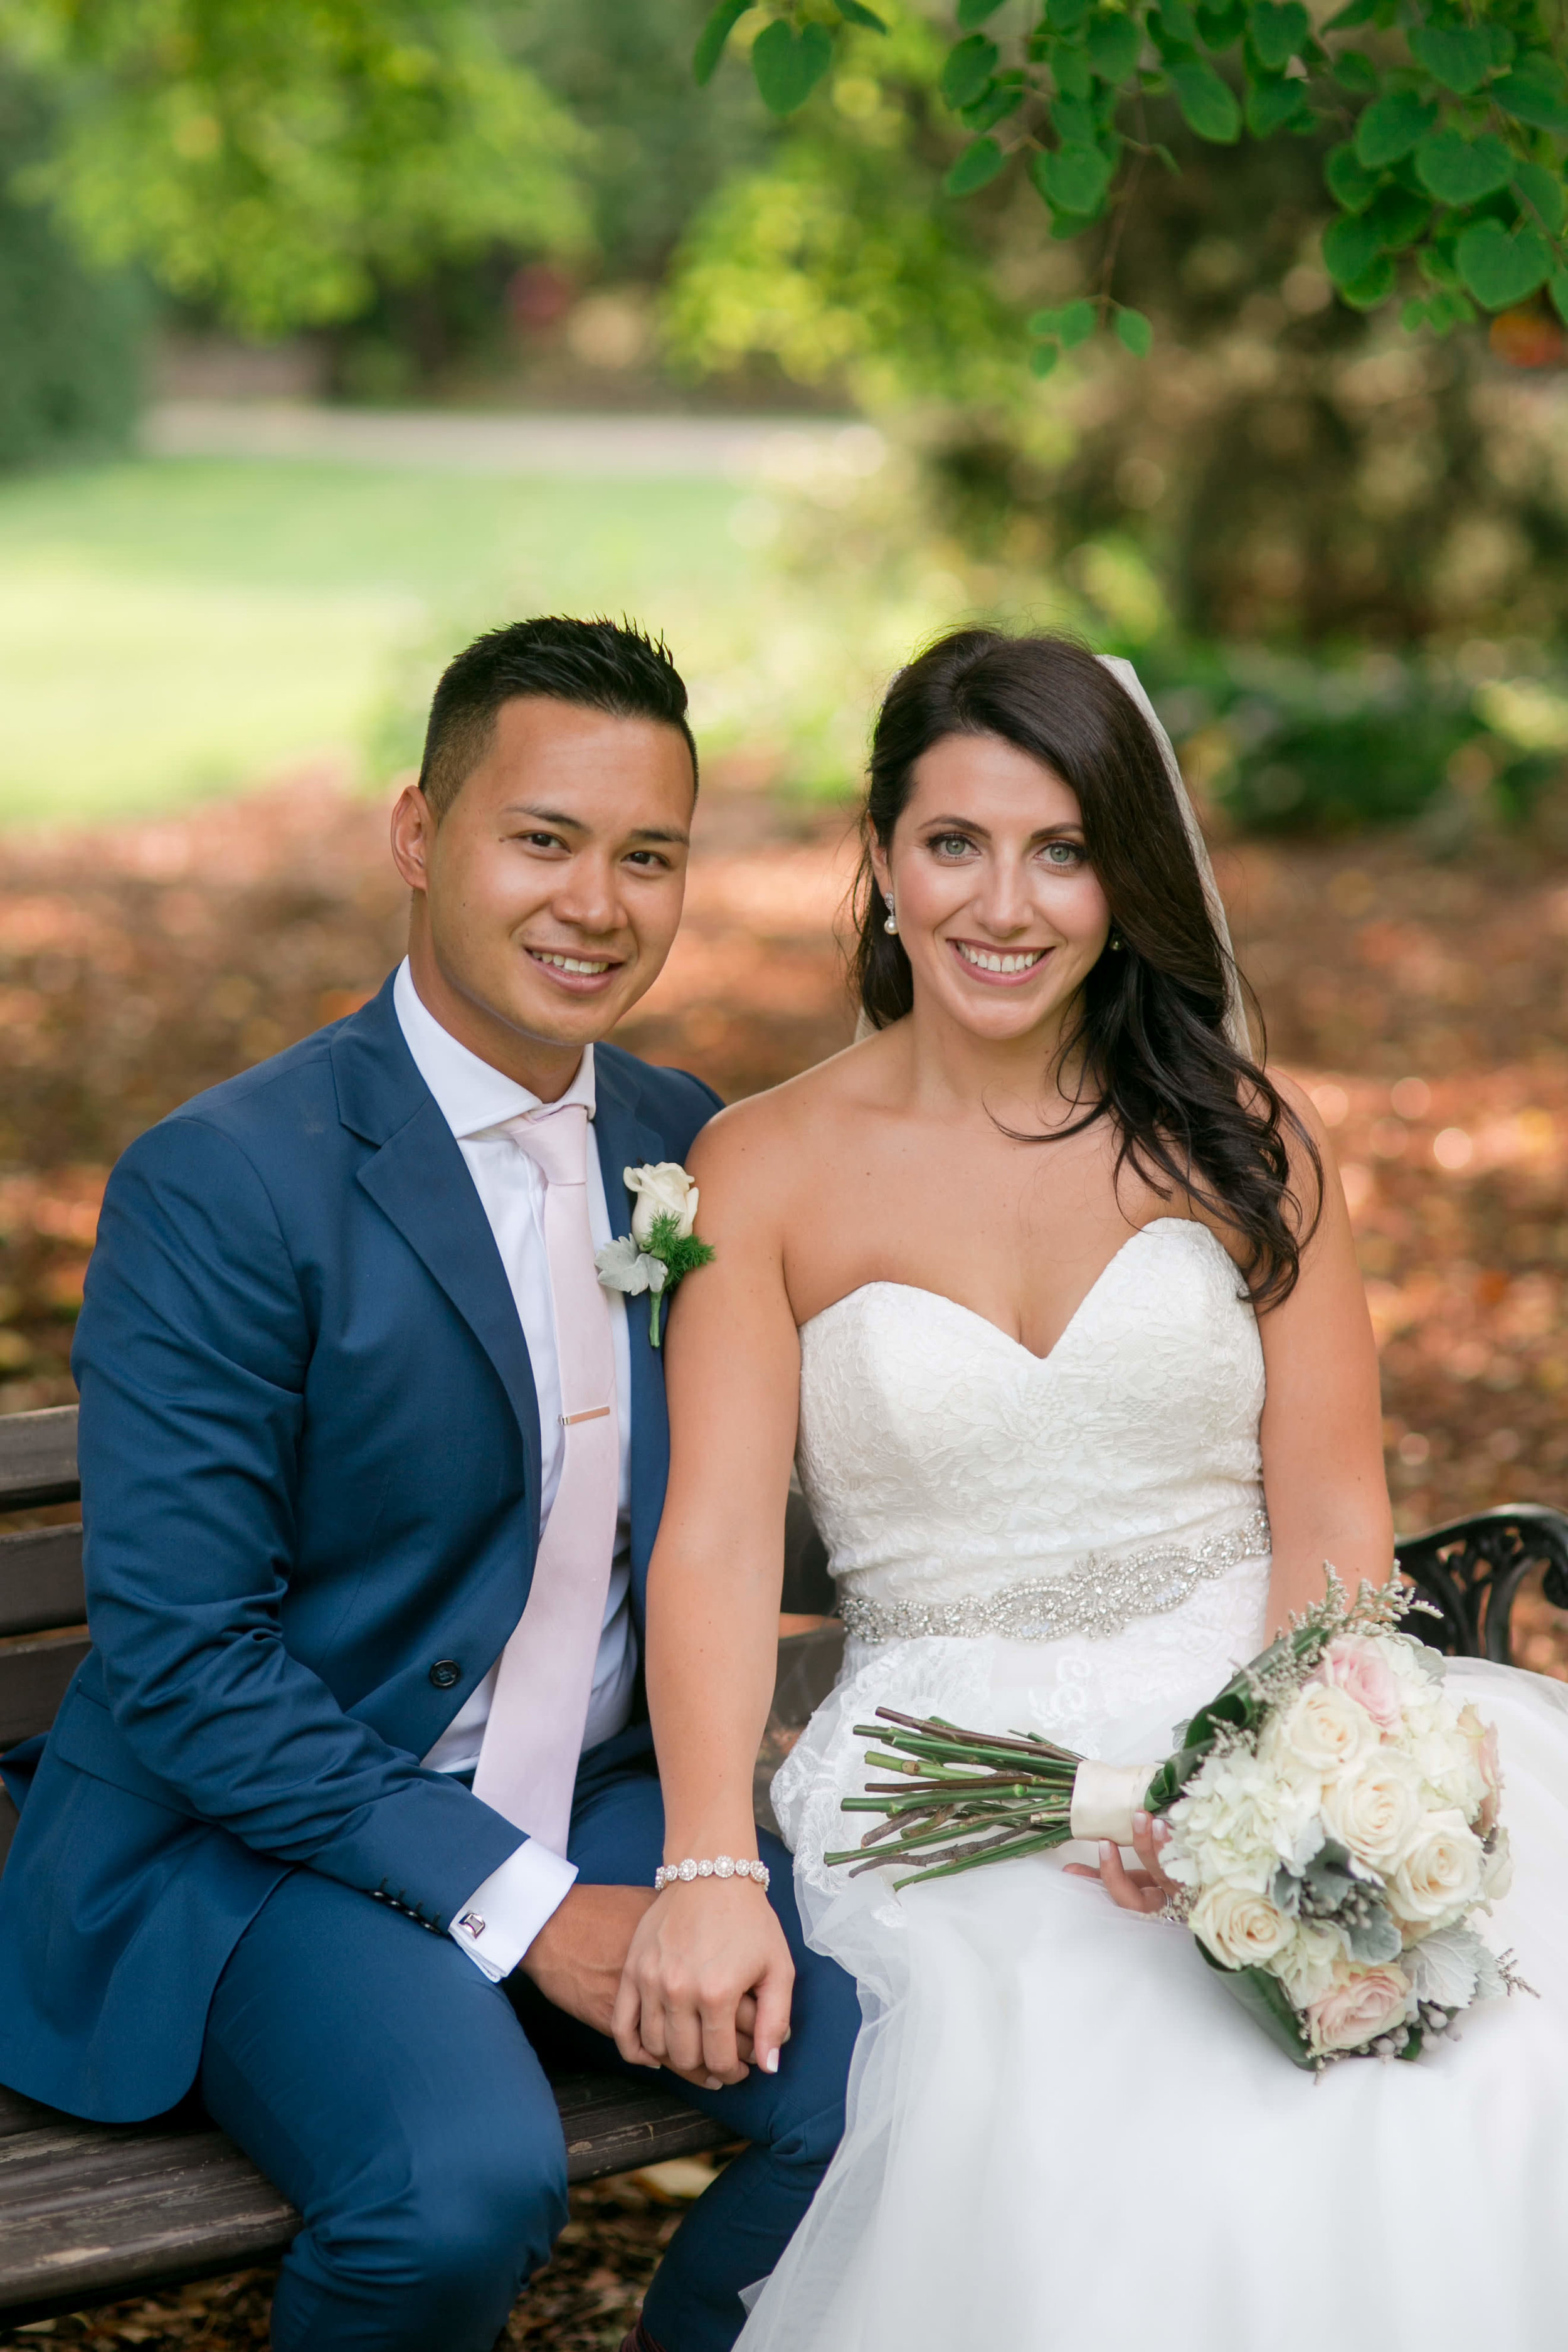 Stefanie___Bernard___Daniel_Ricci_Weddings_High_Res._Finals__341.jpg